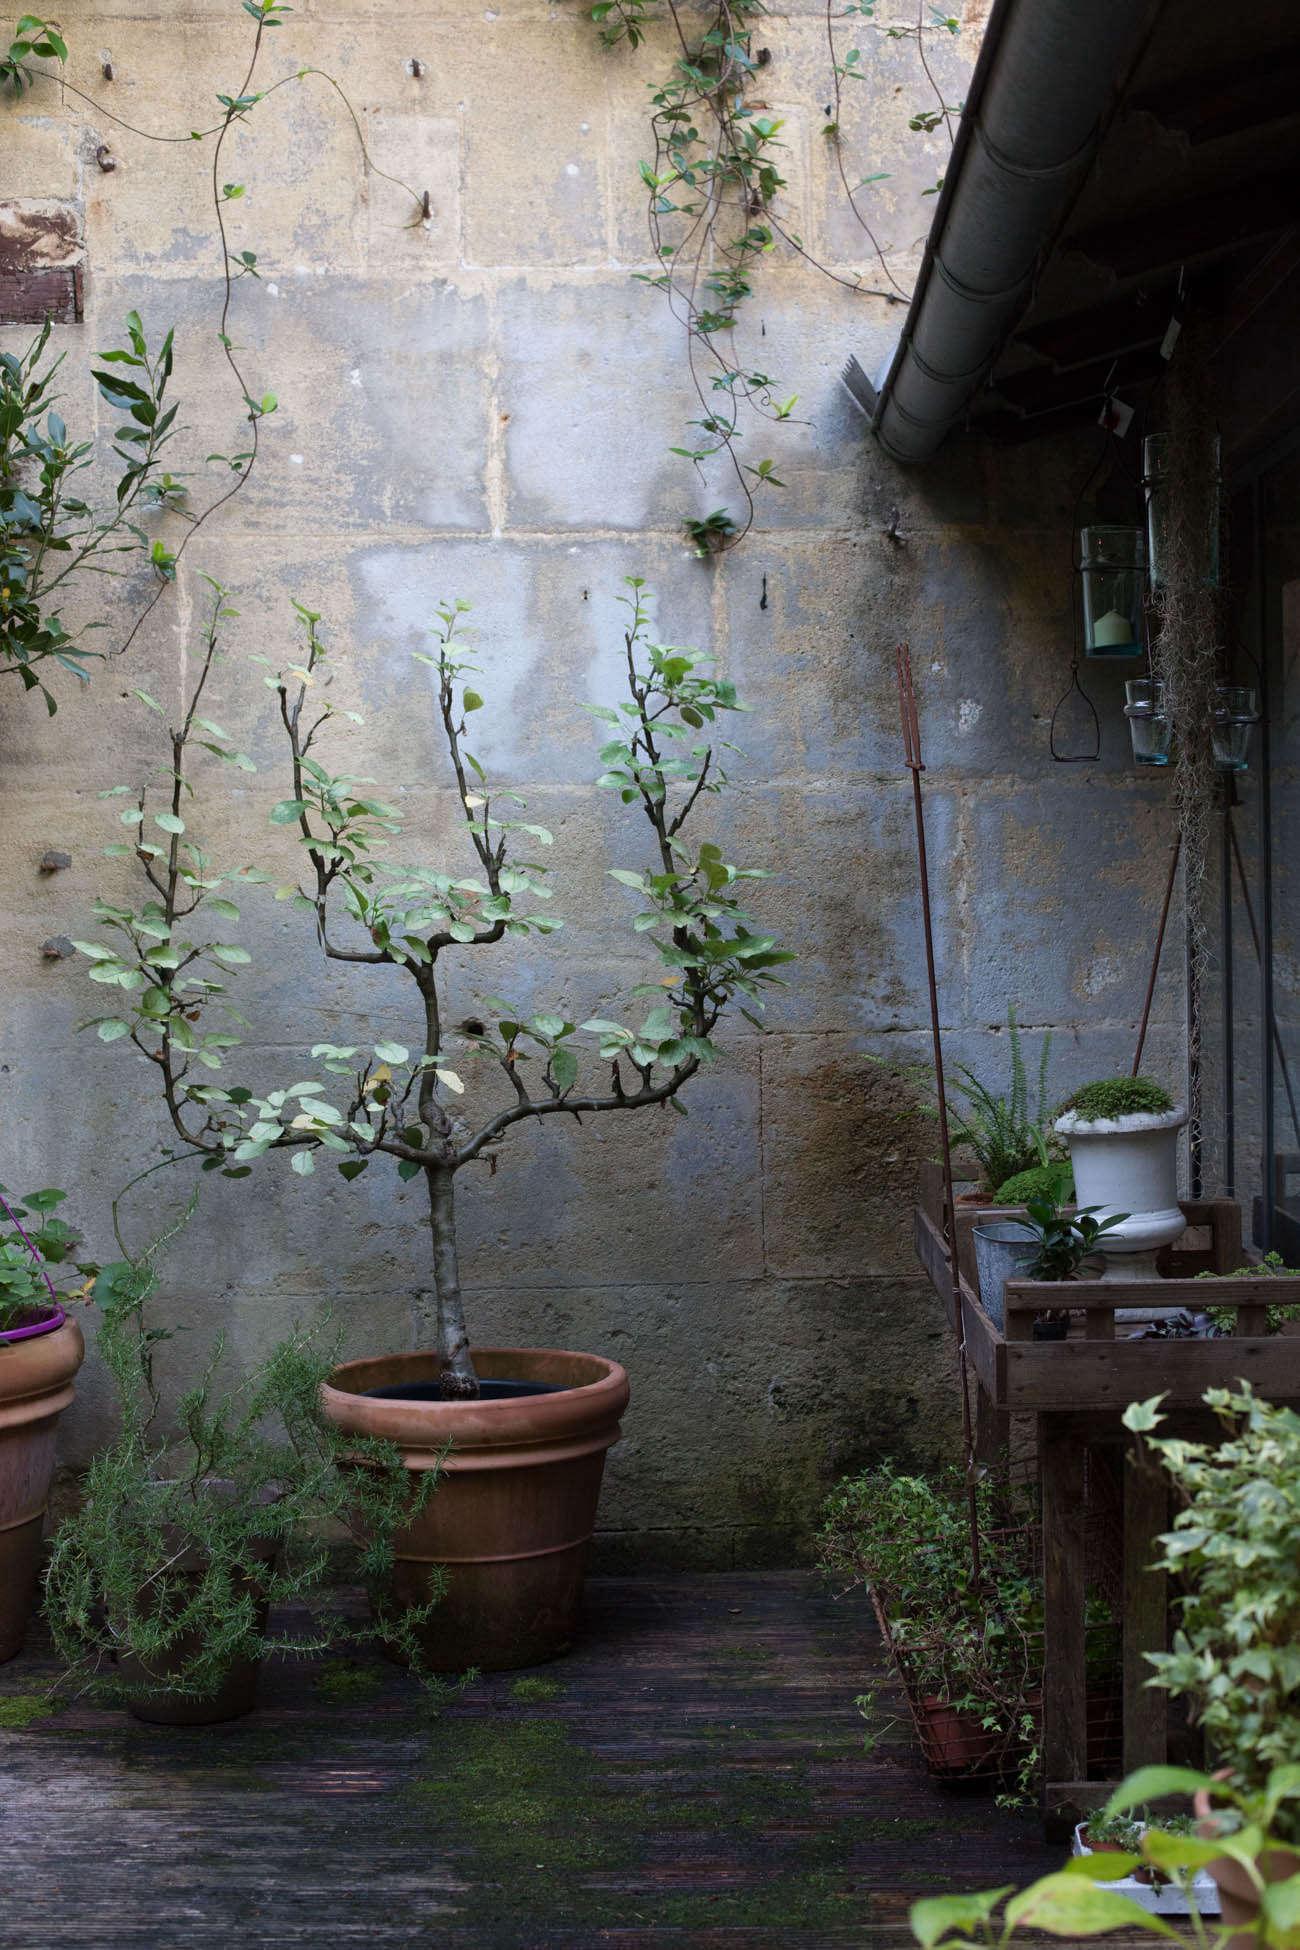 Ambre-store-france-mimi-giboin-gardenista-010